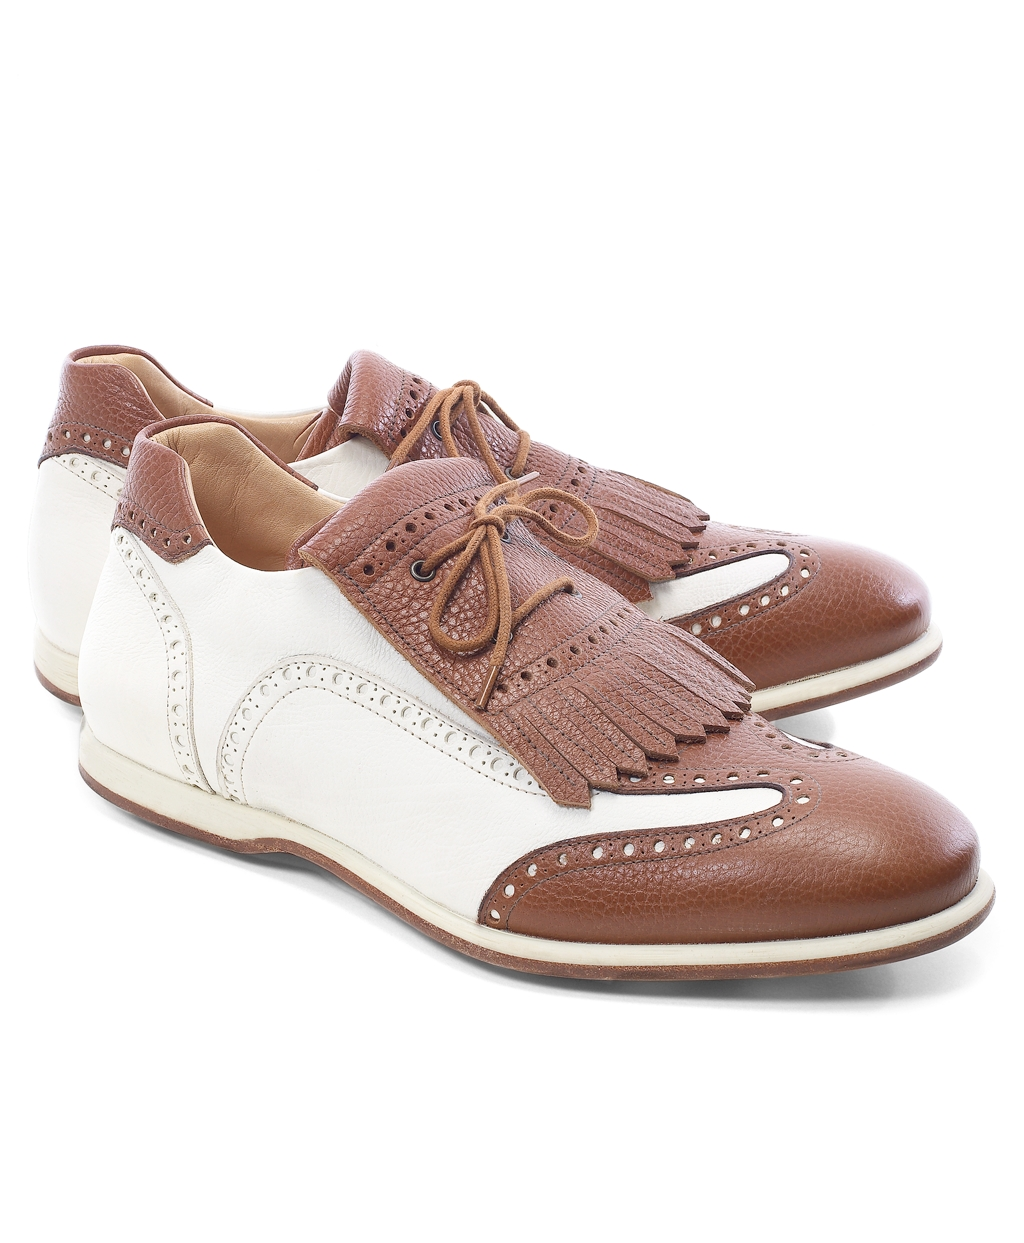 Kiltie Mens Golf Shoes